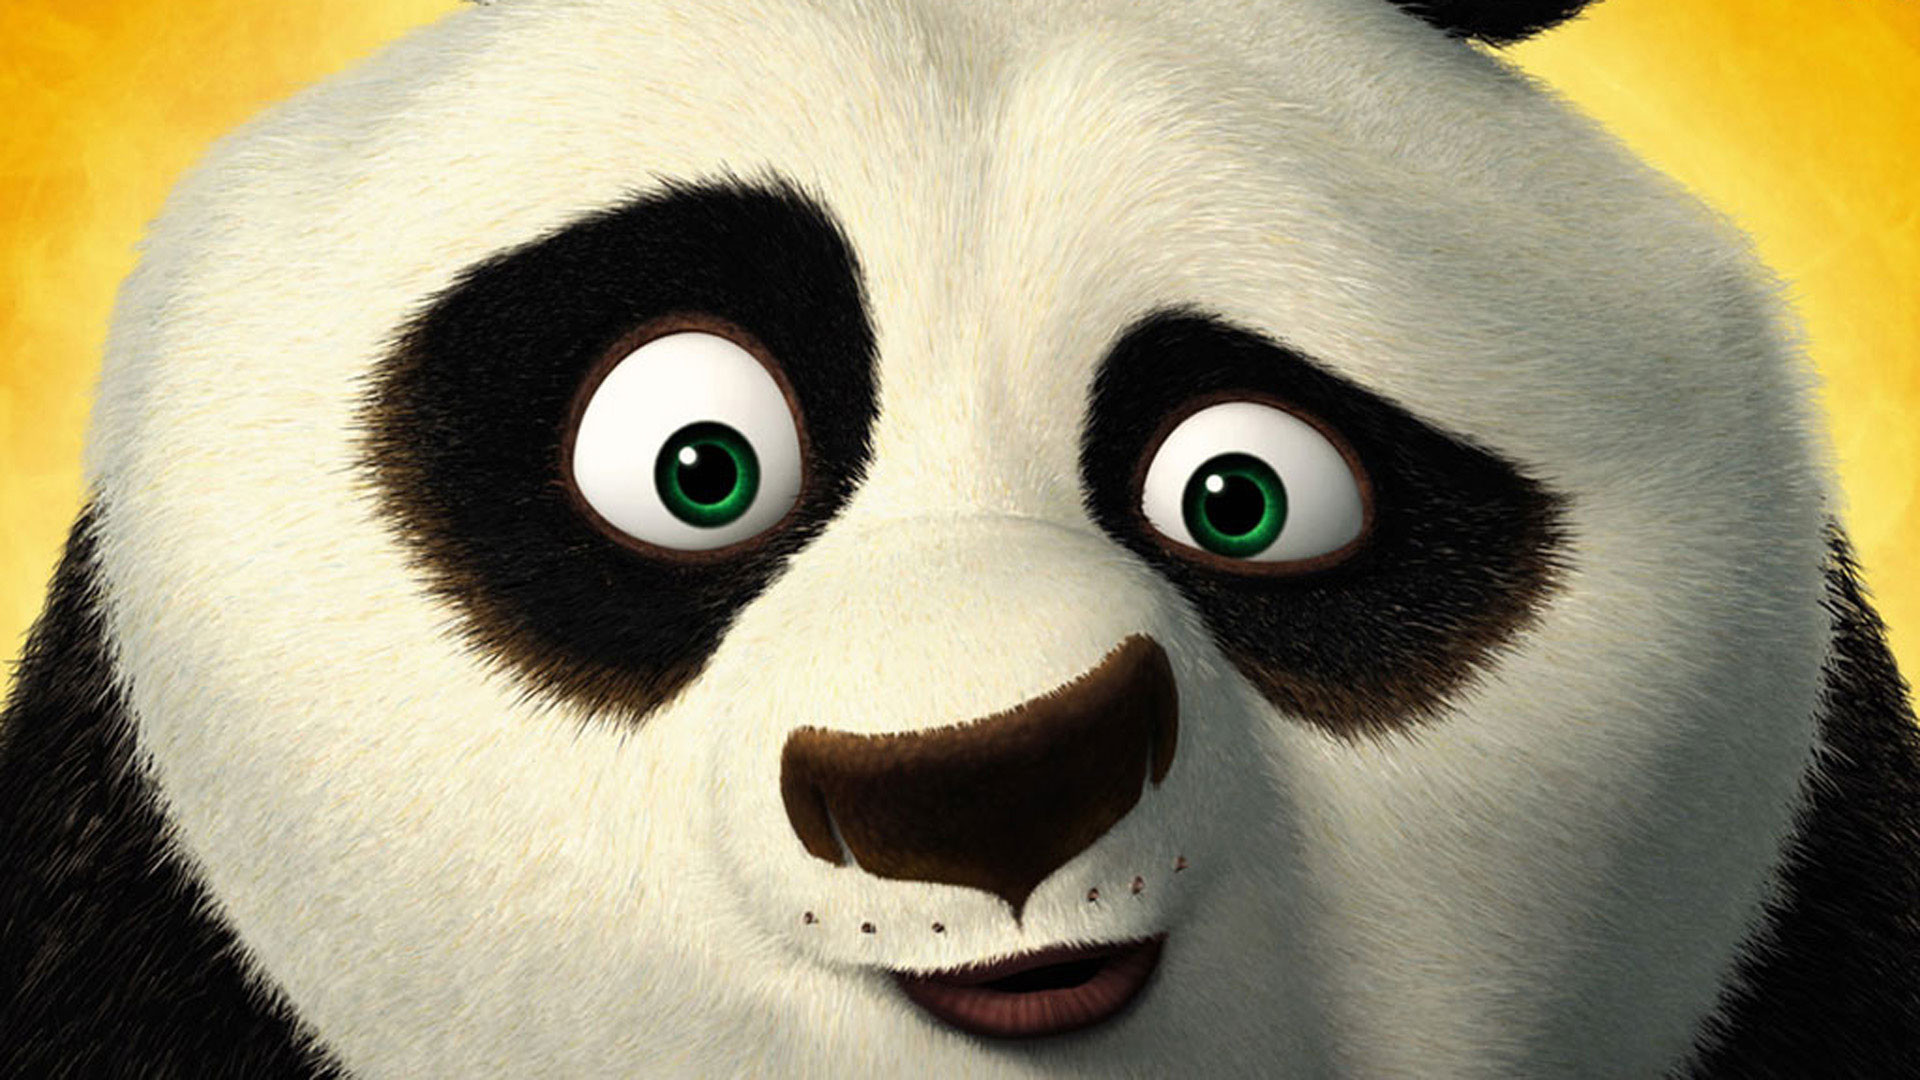 1920x1080 hd pics photos cartoon panda kungfu desktop background wallpaper